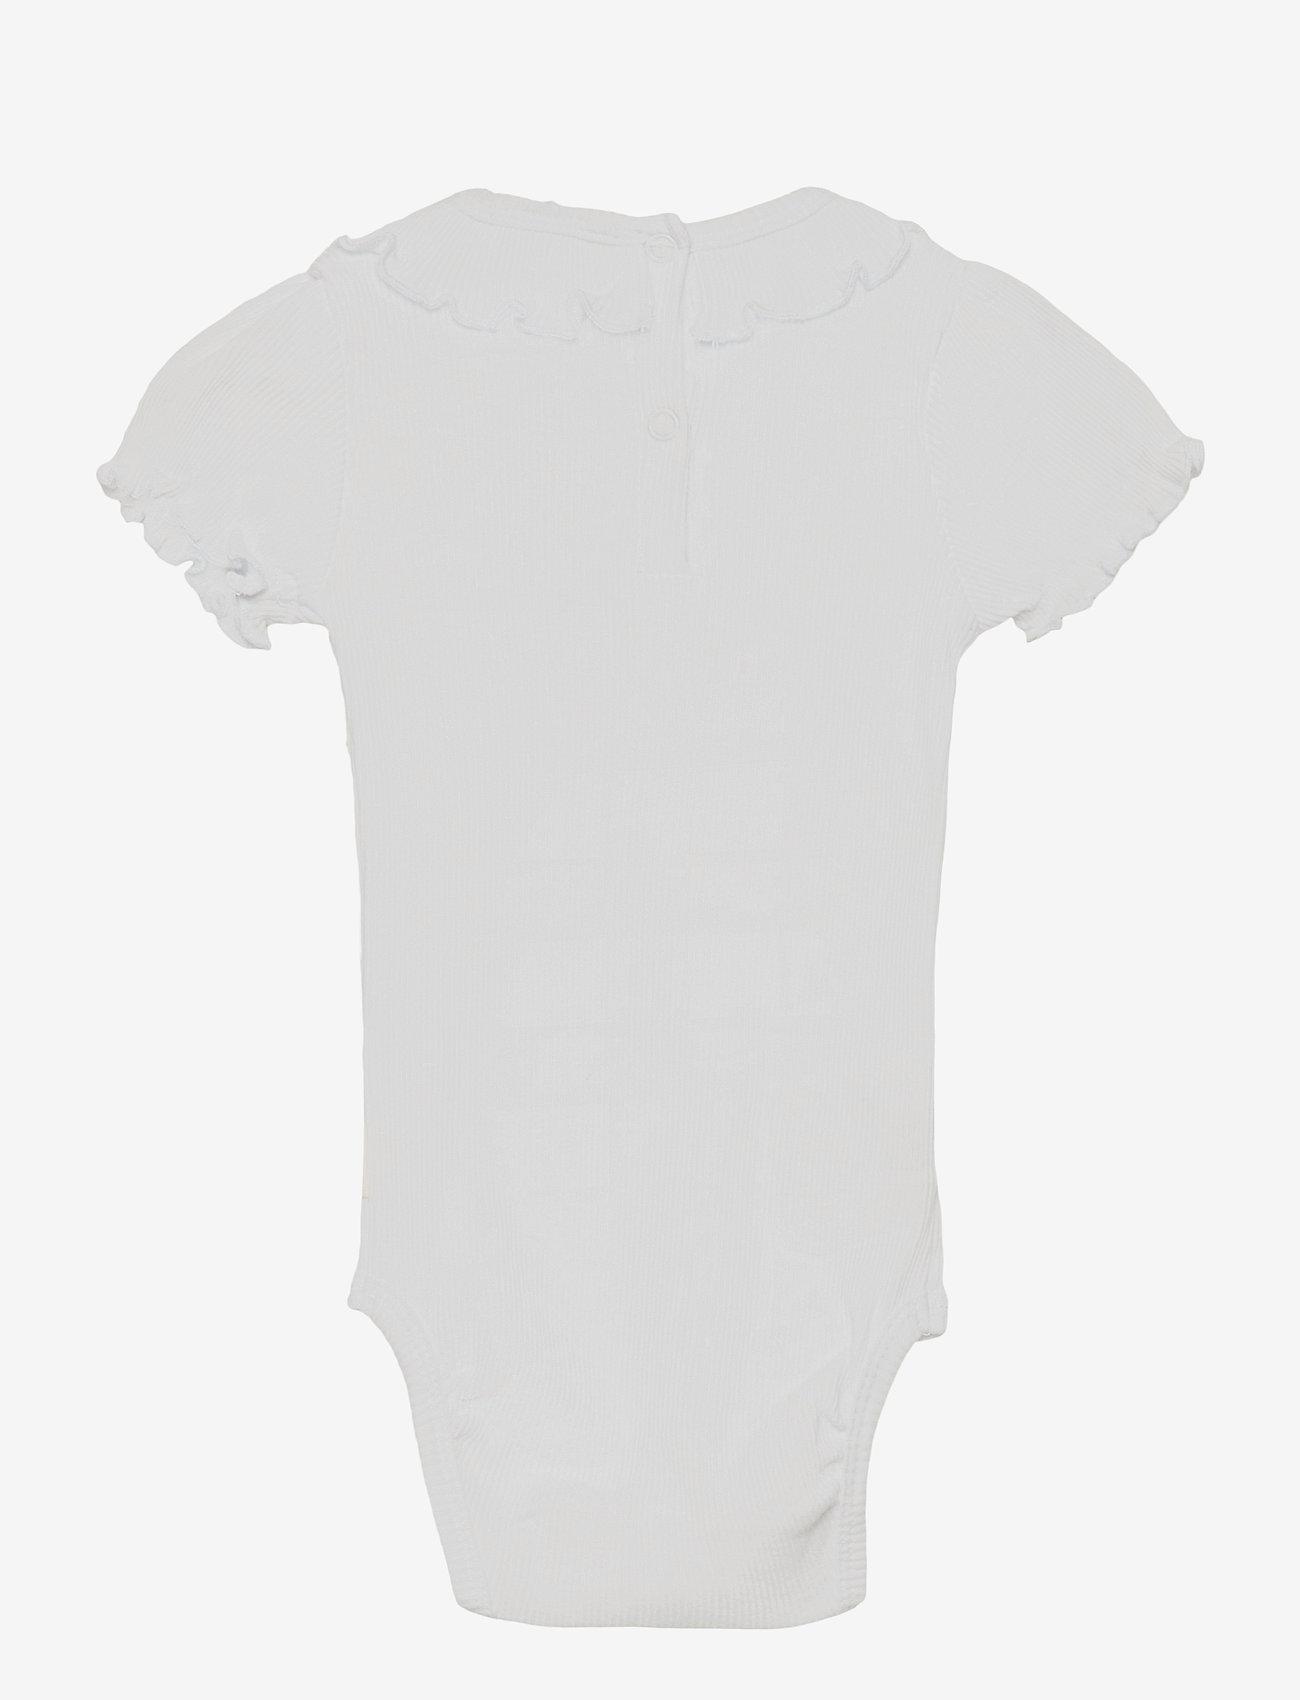 Hust & Claire - Bibbi - Bodystocking - kurzärmelige - white - 1